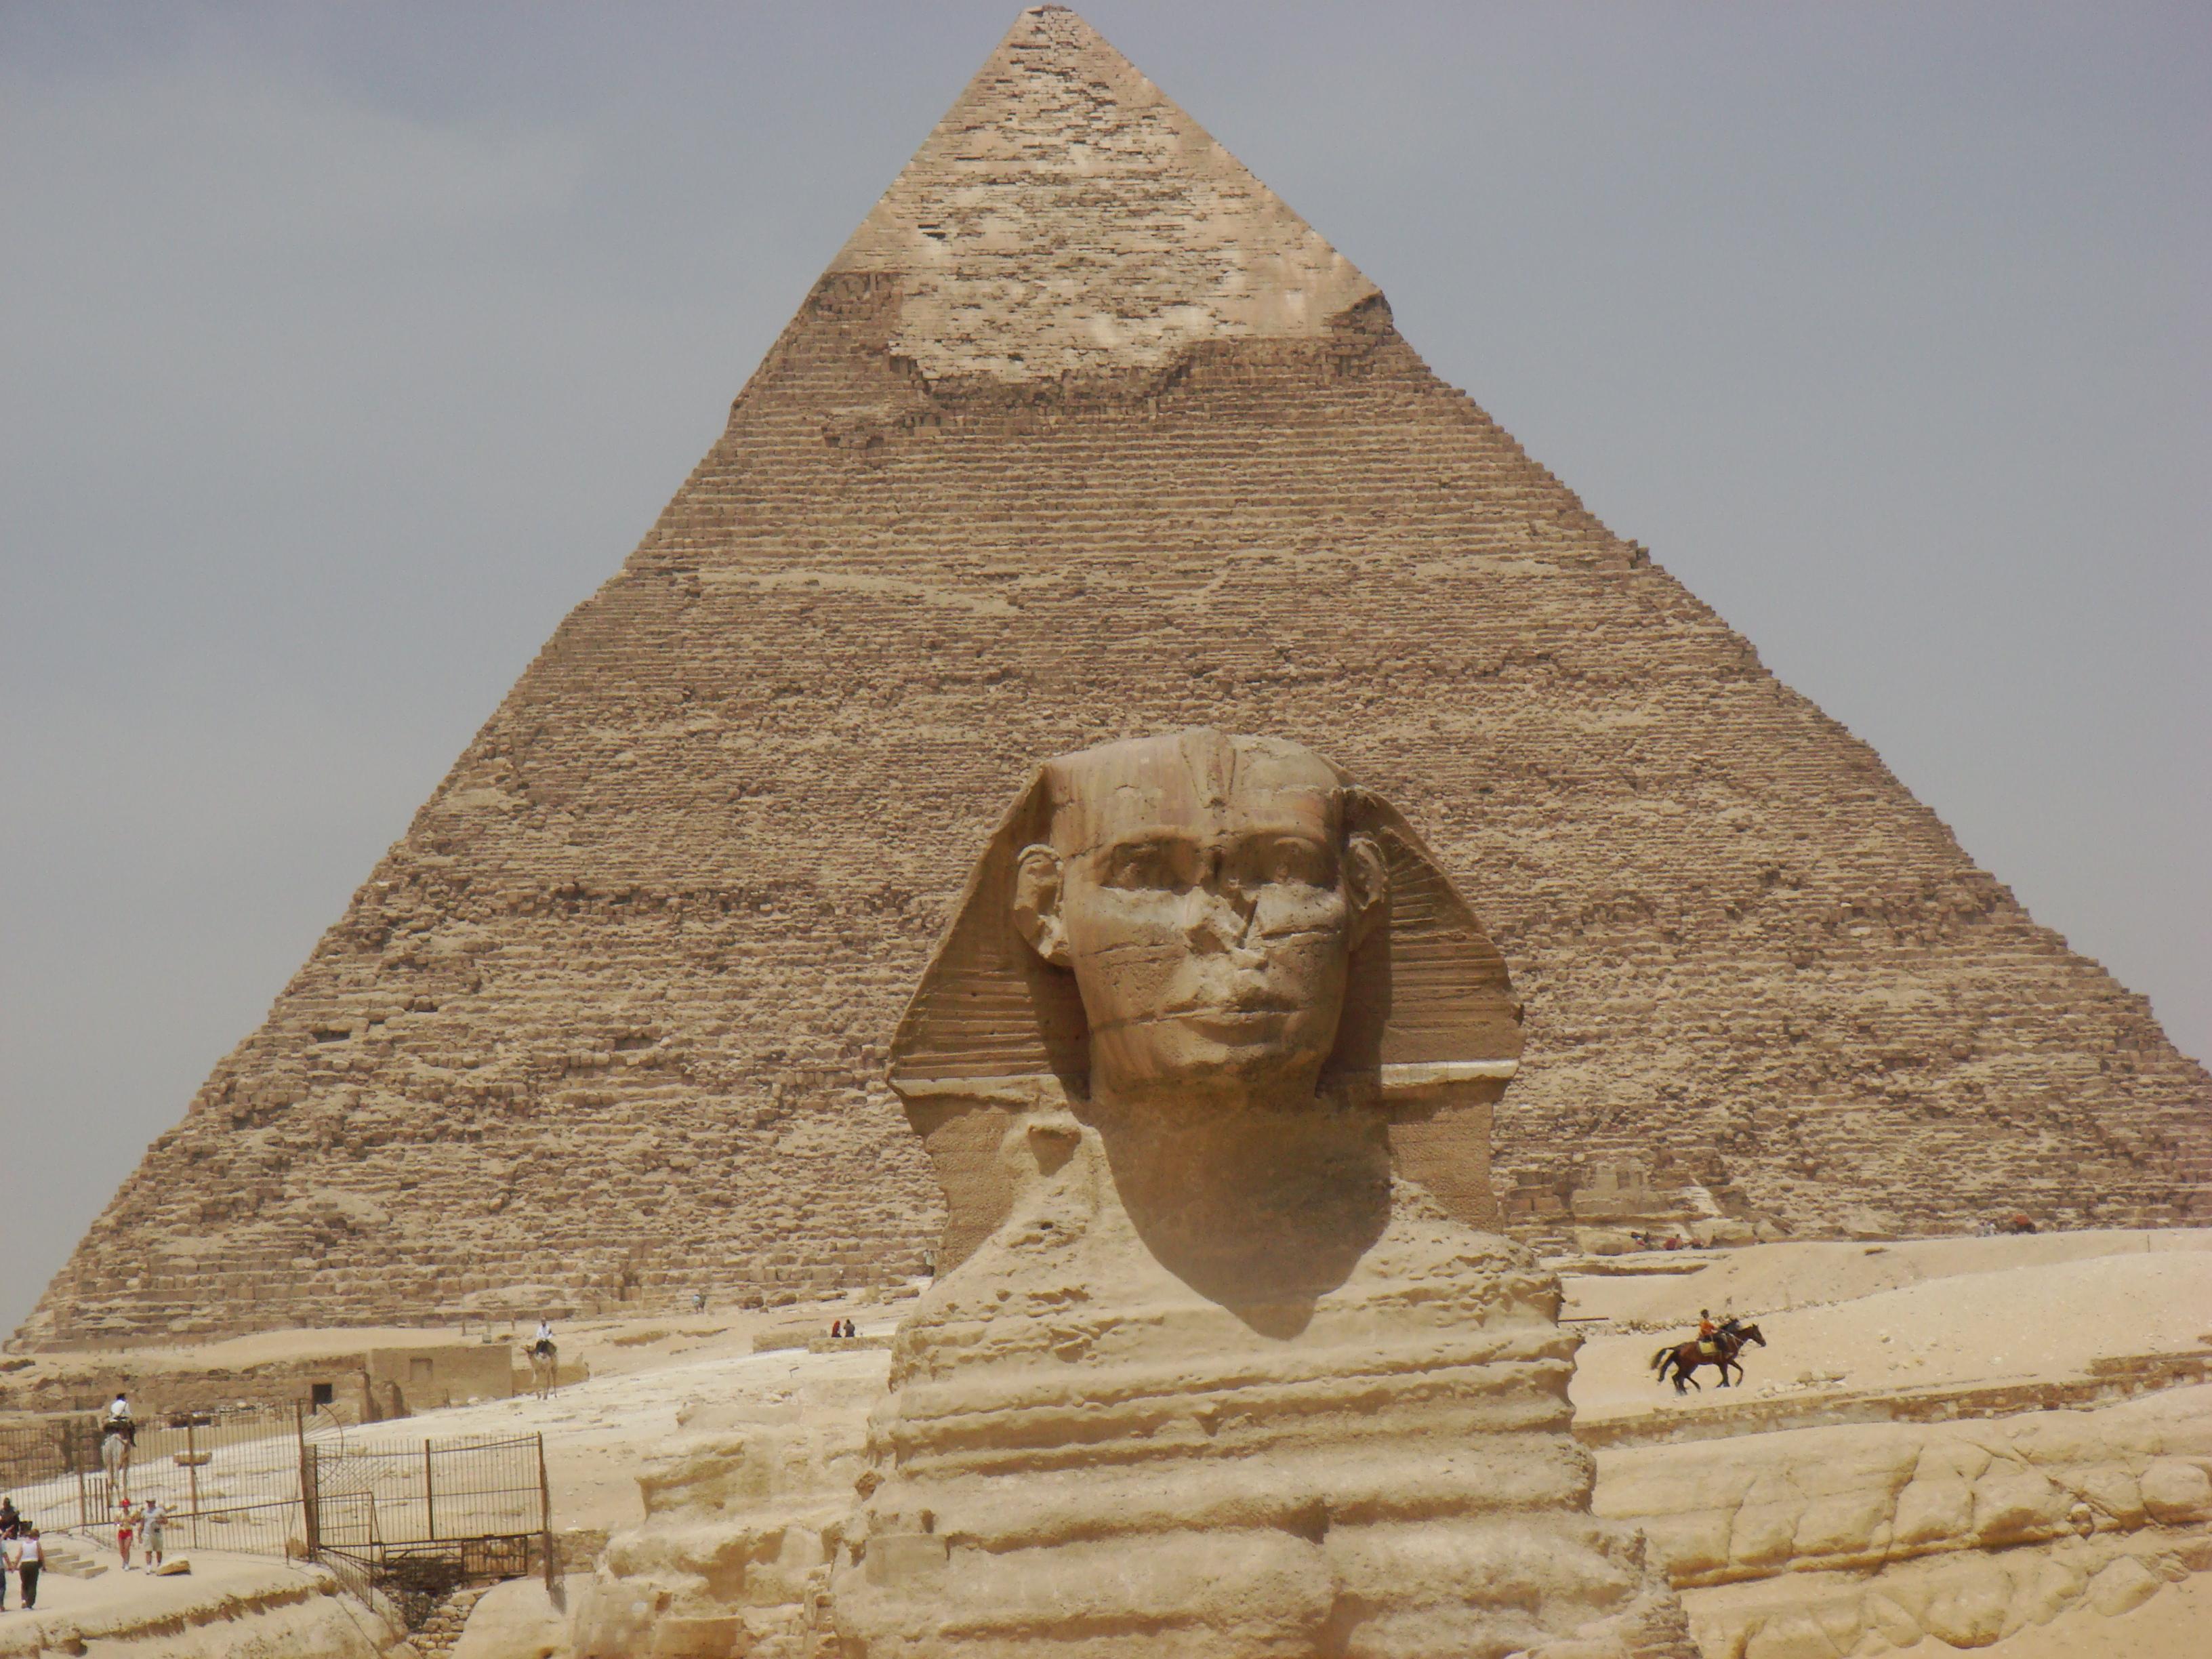 47+] Great Pyramid Wallpaper on WallpaperSafari